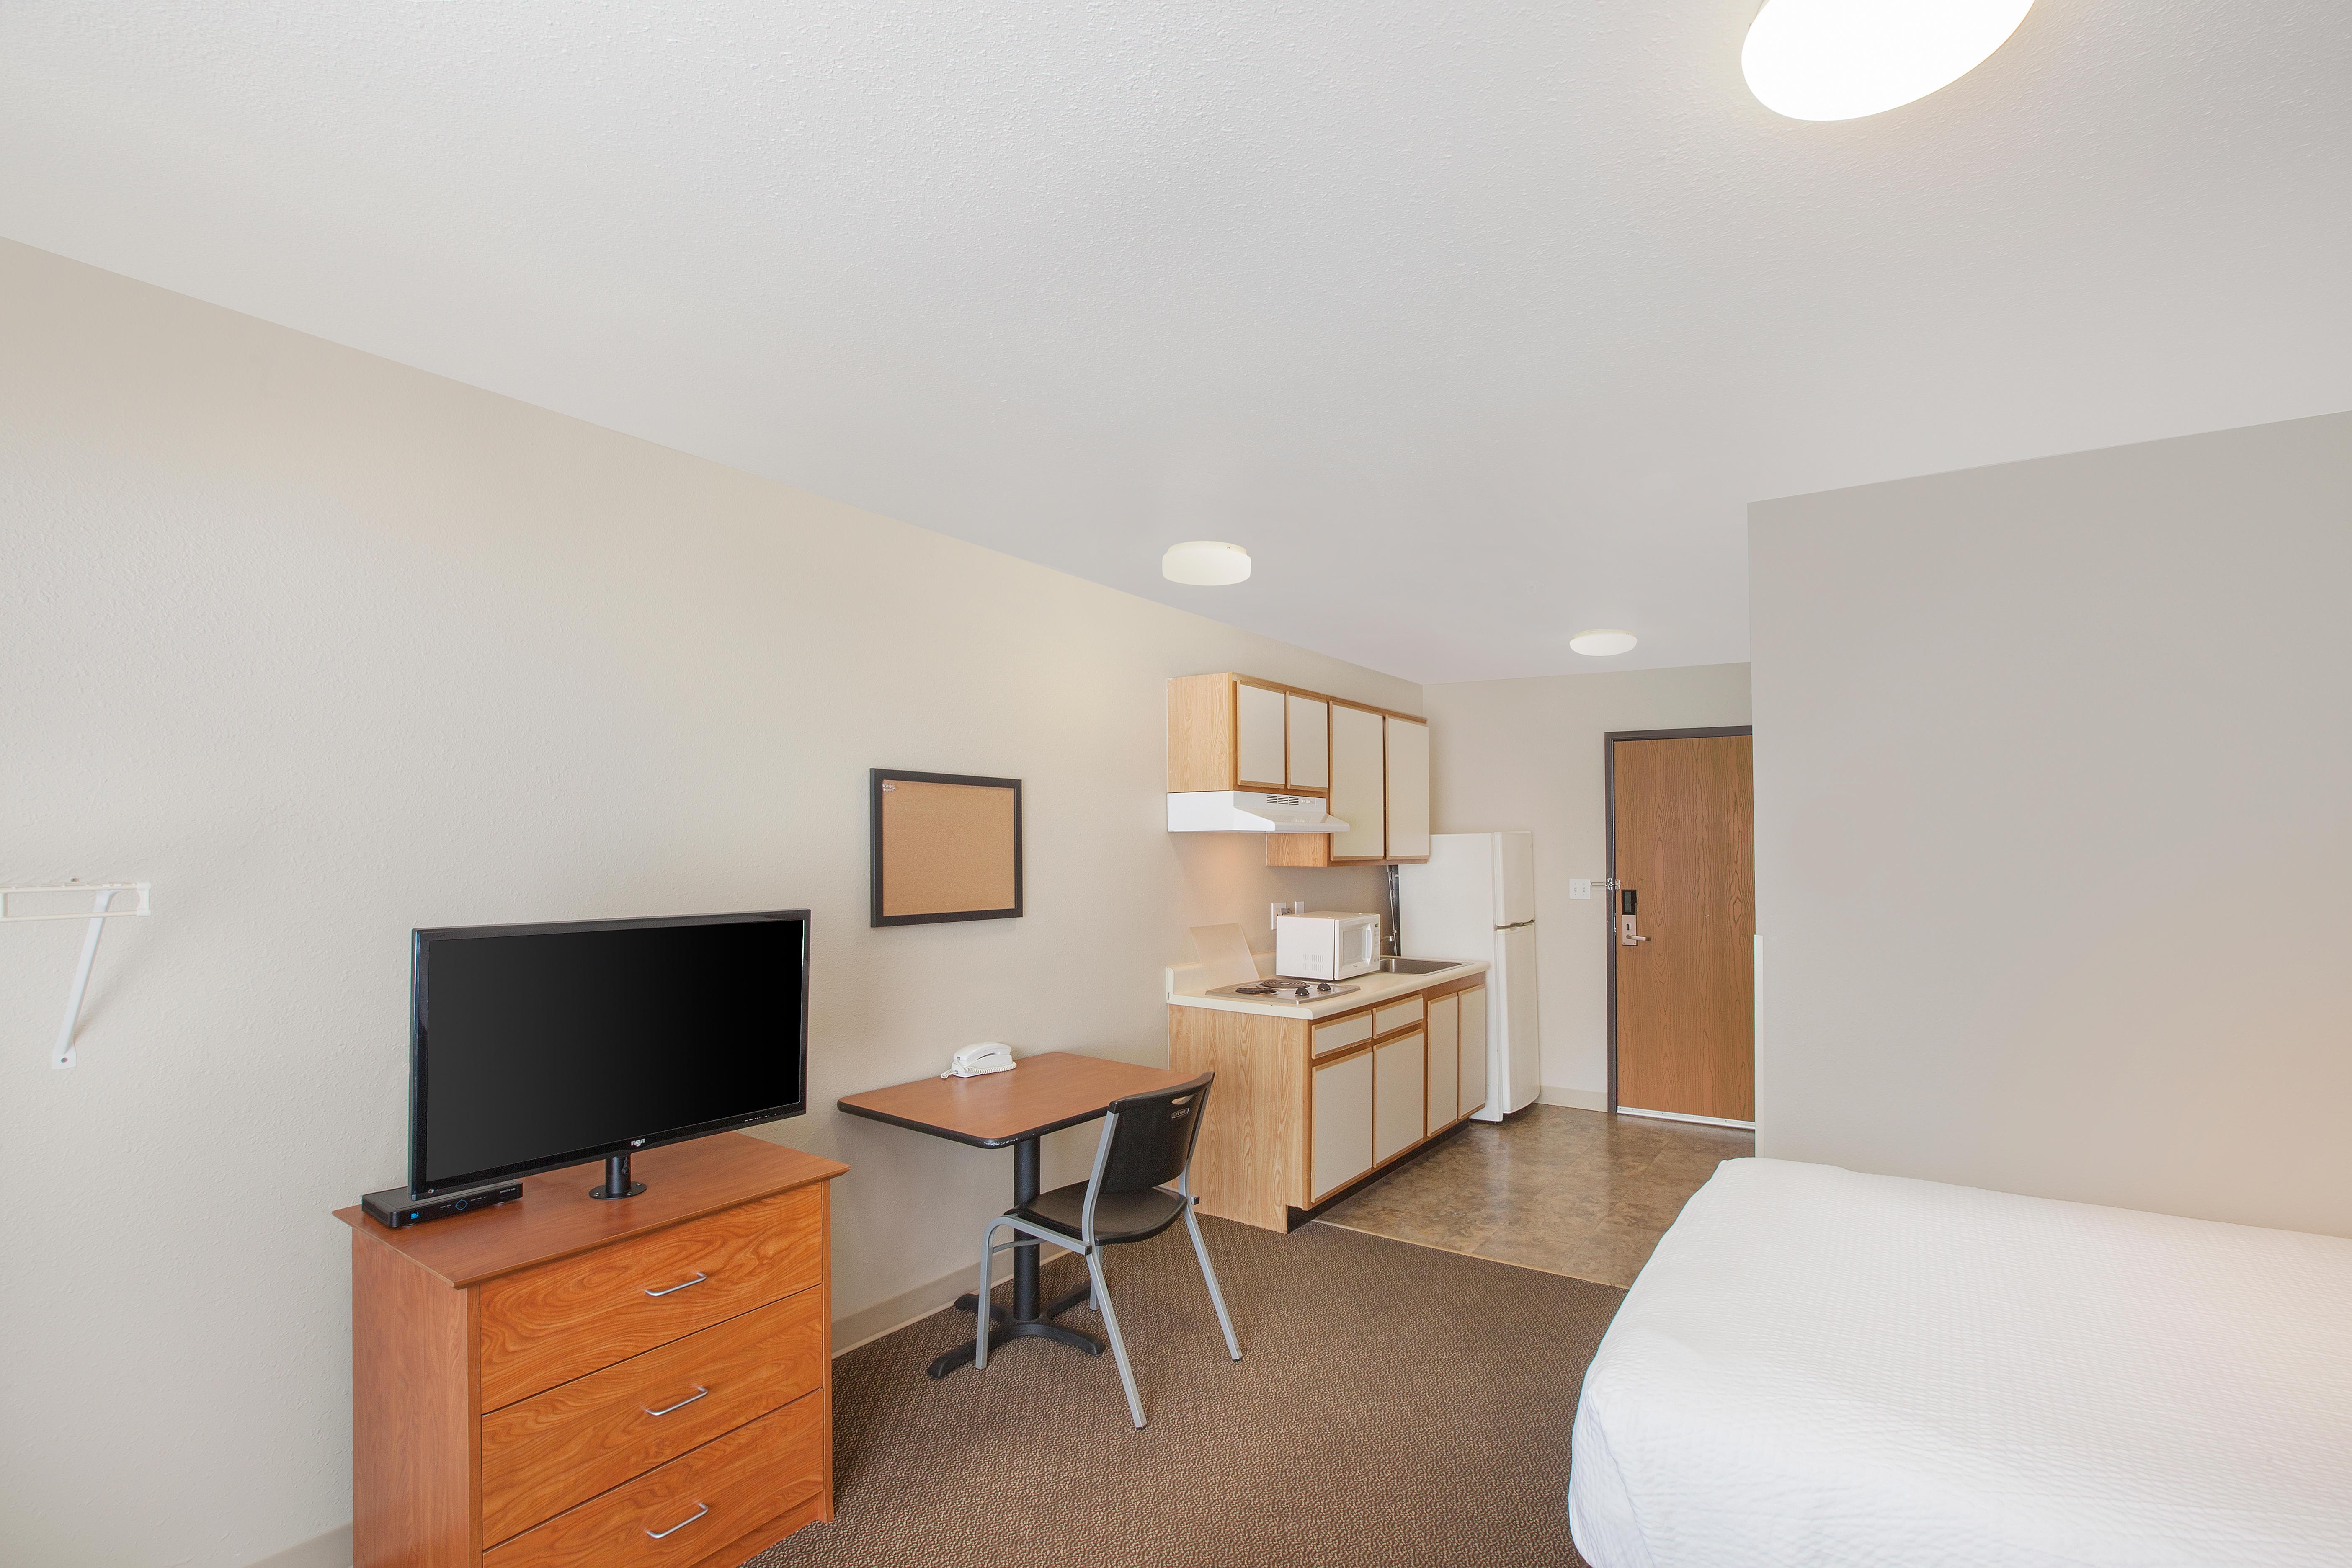 WoodSpring Suites Jacksonville Southeast image 0